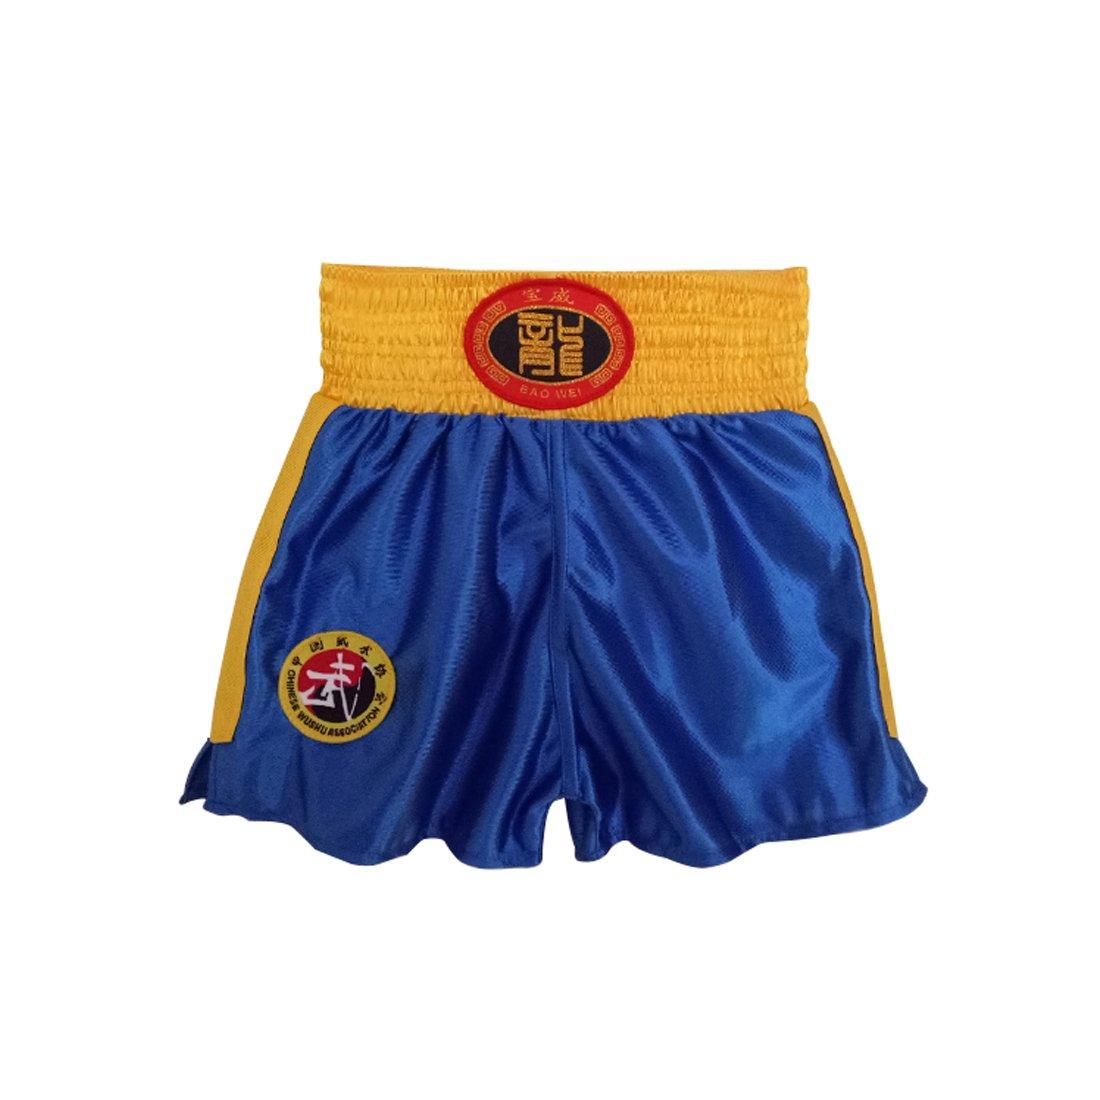 MUCHAO Enfants Sanda V/êtements Gar/çons et Filles Adulte Boxe Boxe Shorts Muay Thai V/êtements Arts Martiaux Formation V/êtements